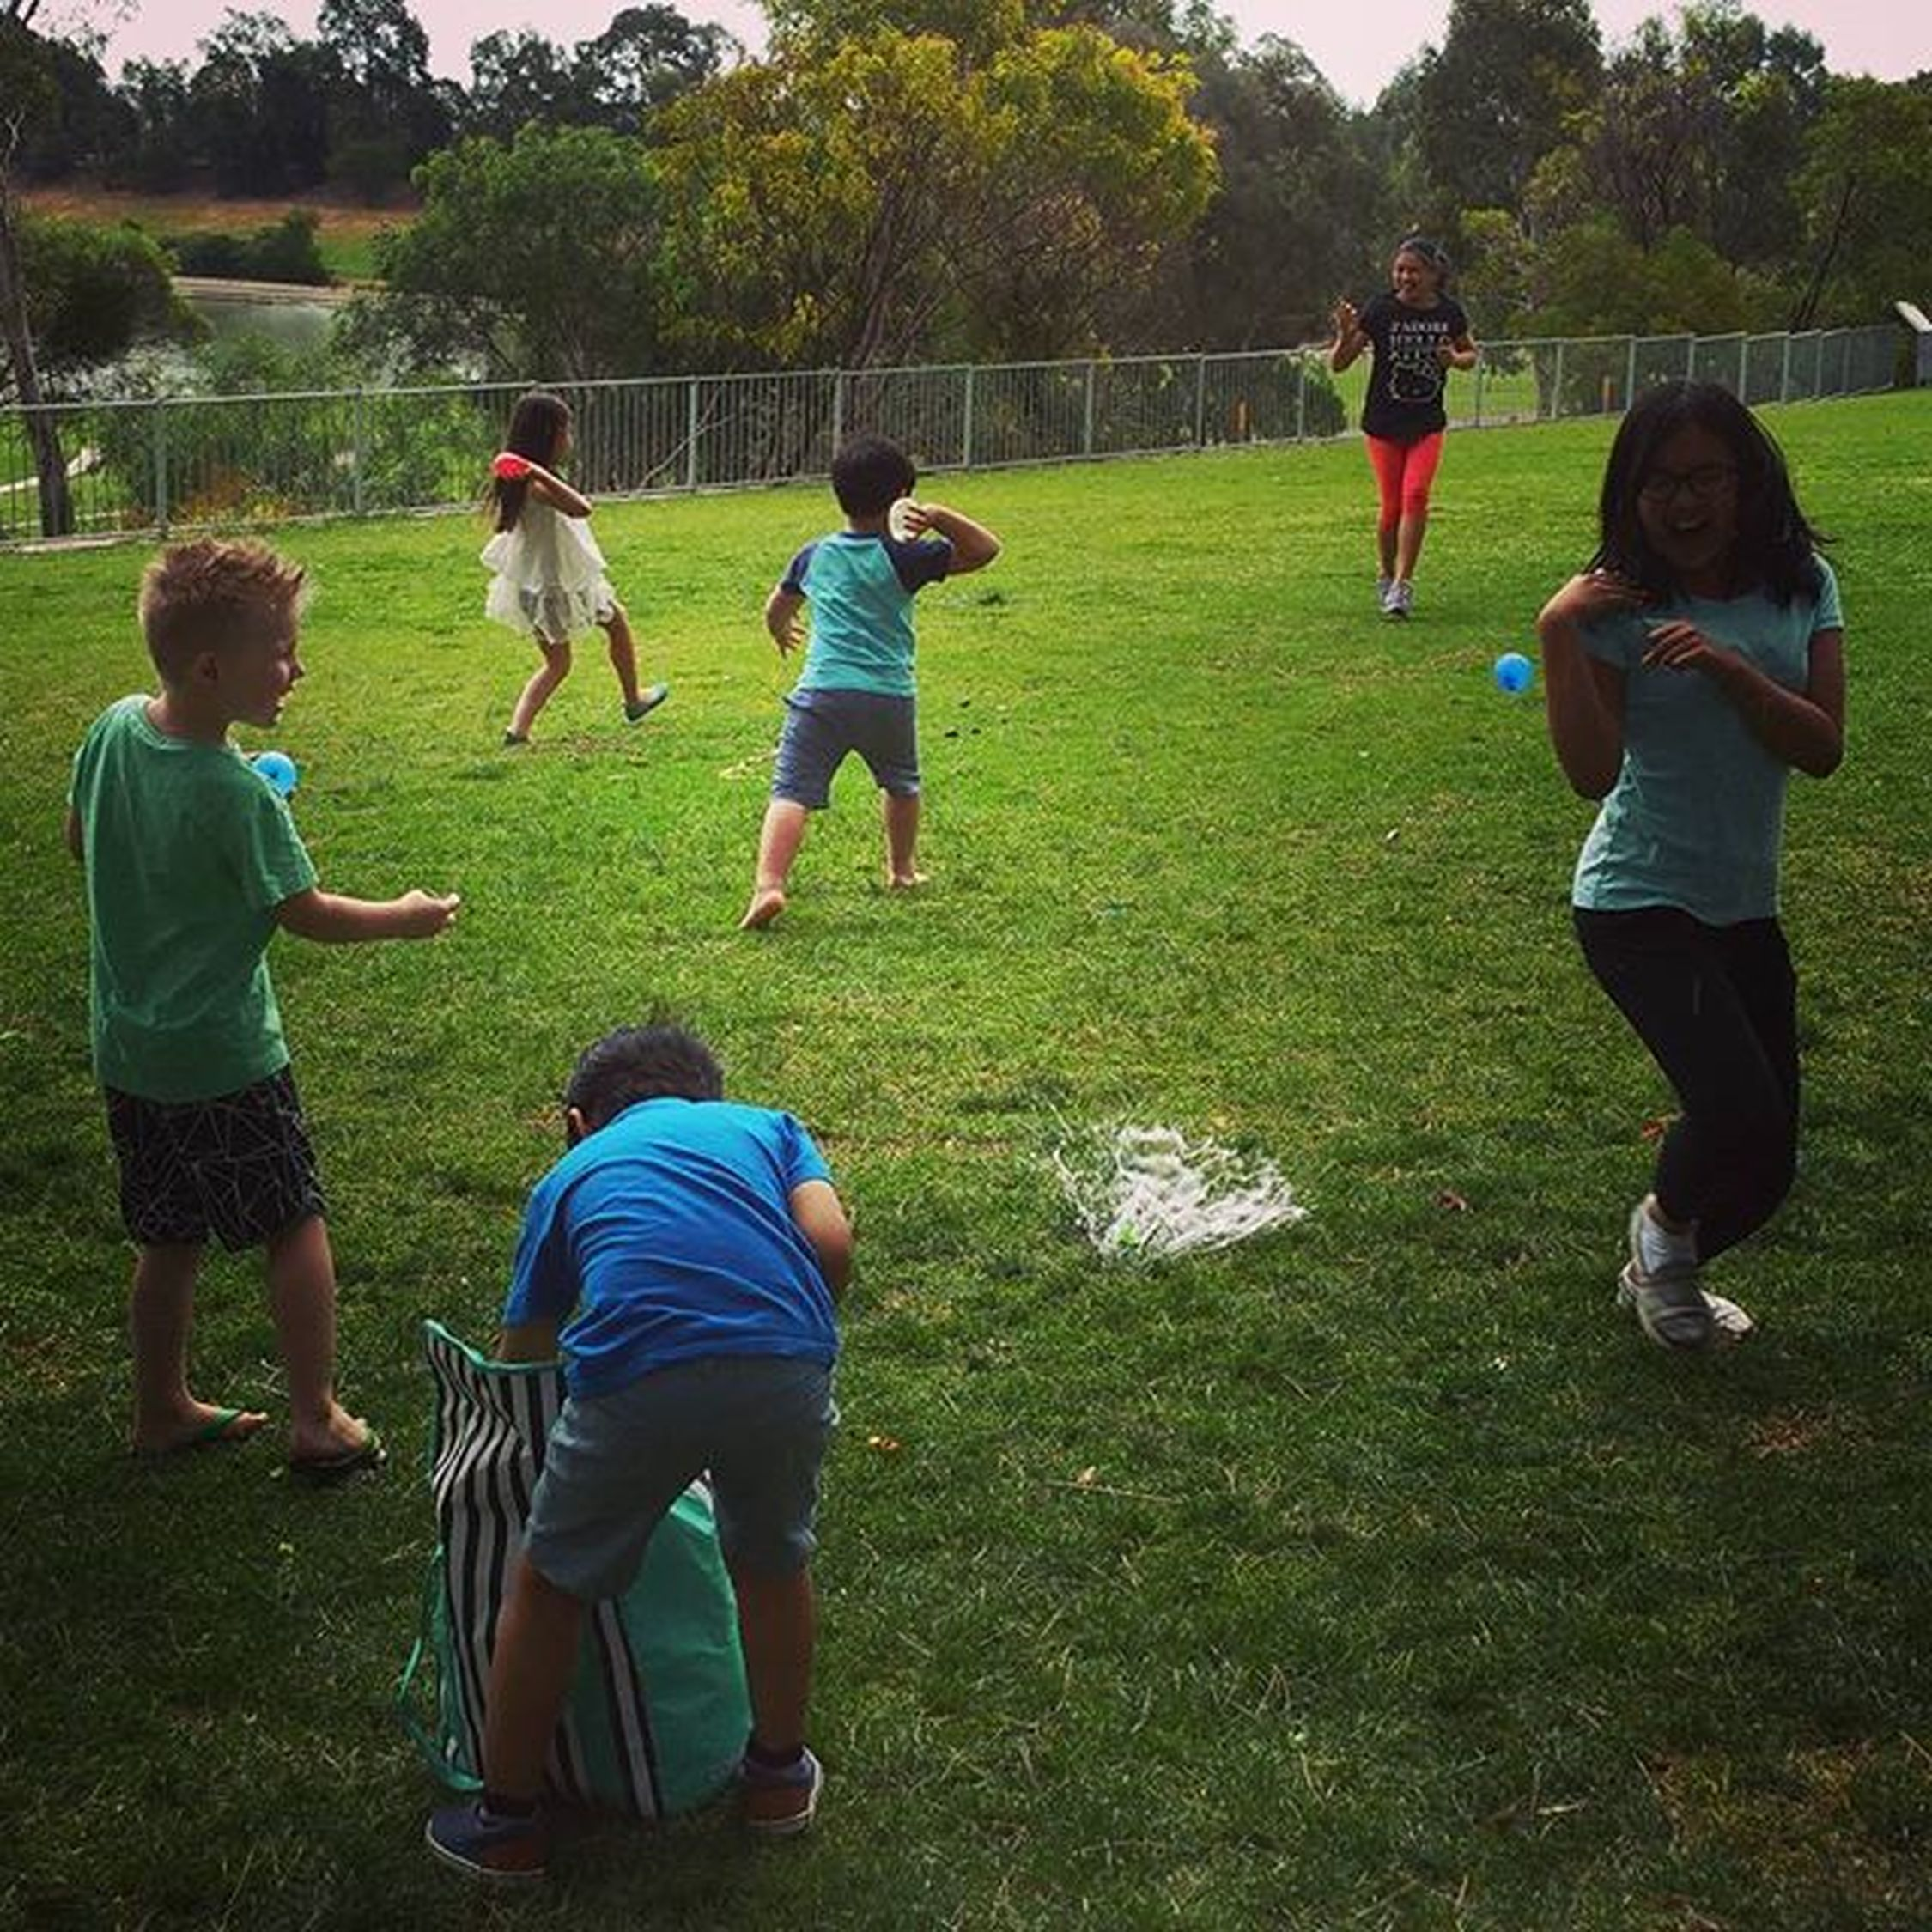 The highlight of the day: waterballoon fight!!! Adventuretime Park Splishsplash Squeal Balloons Superfun Kidsplaying Actionshot Maxadventures Keepingupwithmem